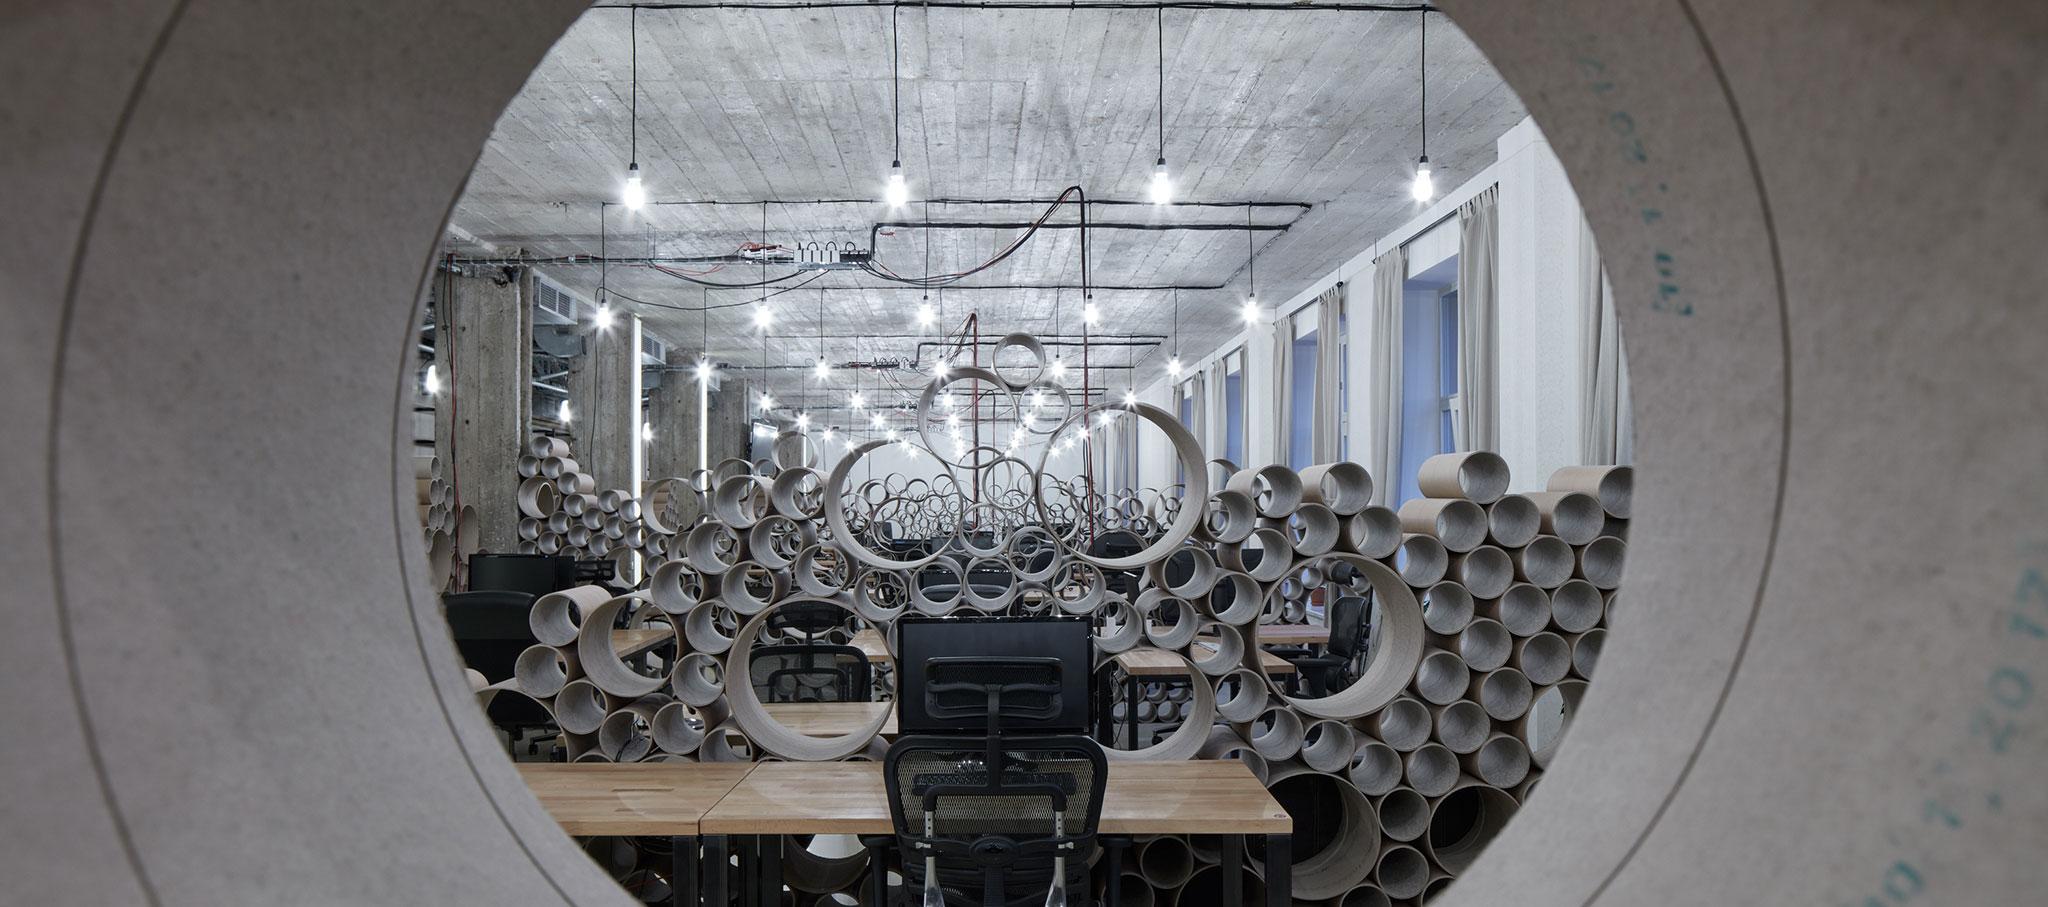 Oficina local para Czech Promotion de Kurz architects. Fotografía por Jakub Skokan and Martin Tůma / BoysPlayNice